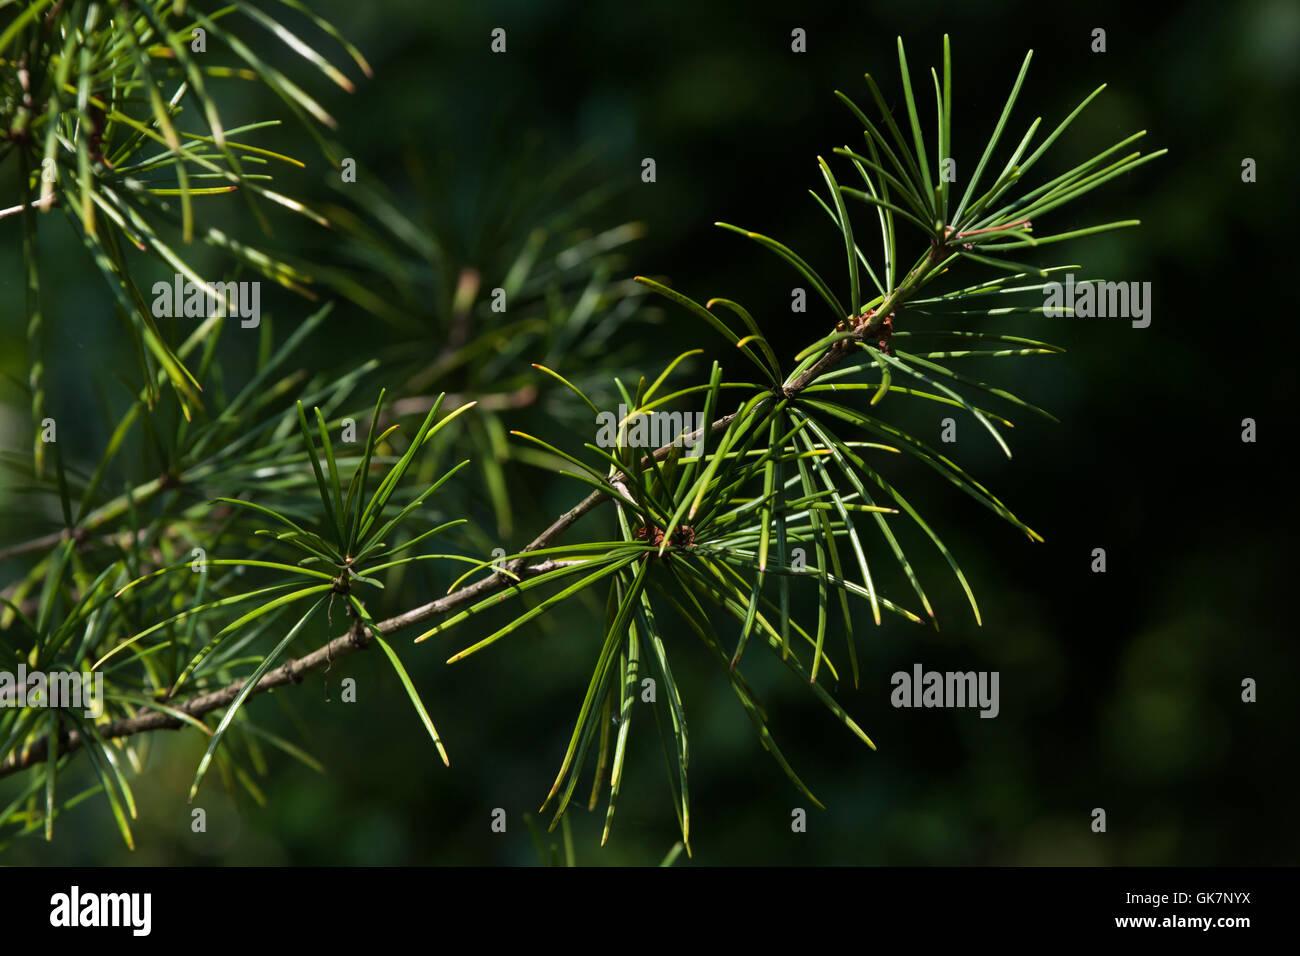 Japanese umbrella pine (Sciadopitys verticillata), also known as the koyamaki. Conifer plant. Stock Photo